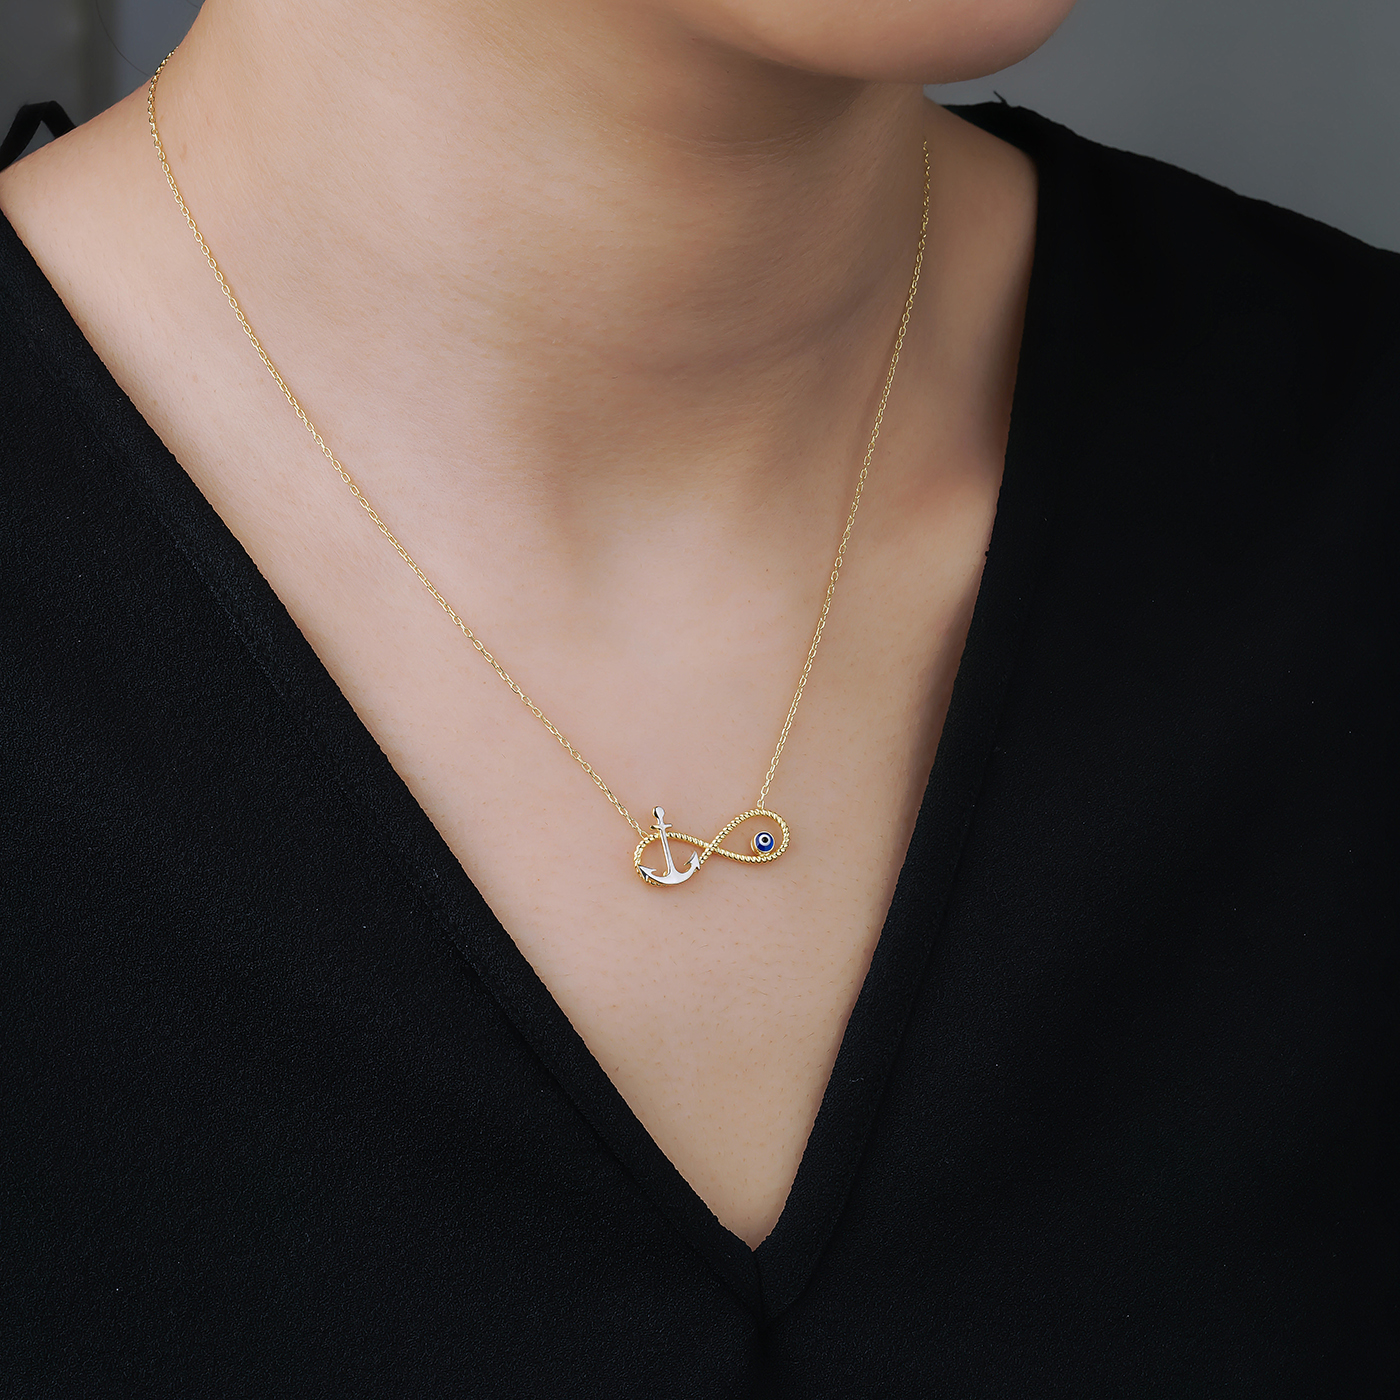 ALMIRA 925 Sterling Silber Damen Halskette Ankerkette Infinity Silberschmuck Augenkette Zirkonia Anh